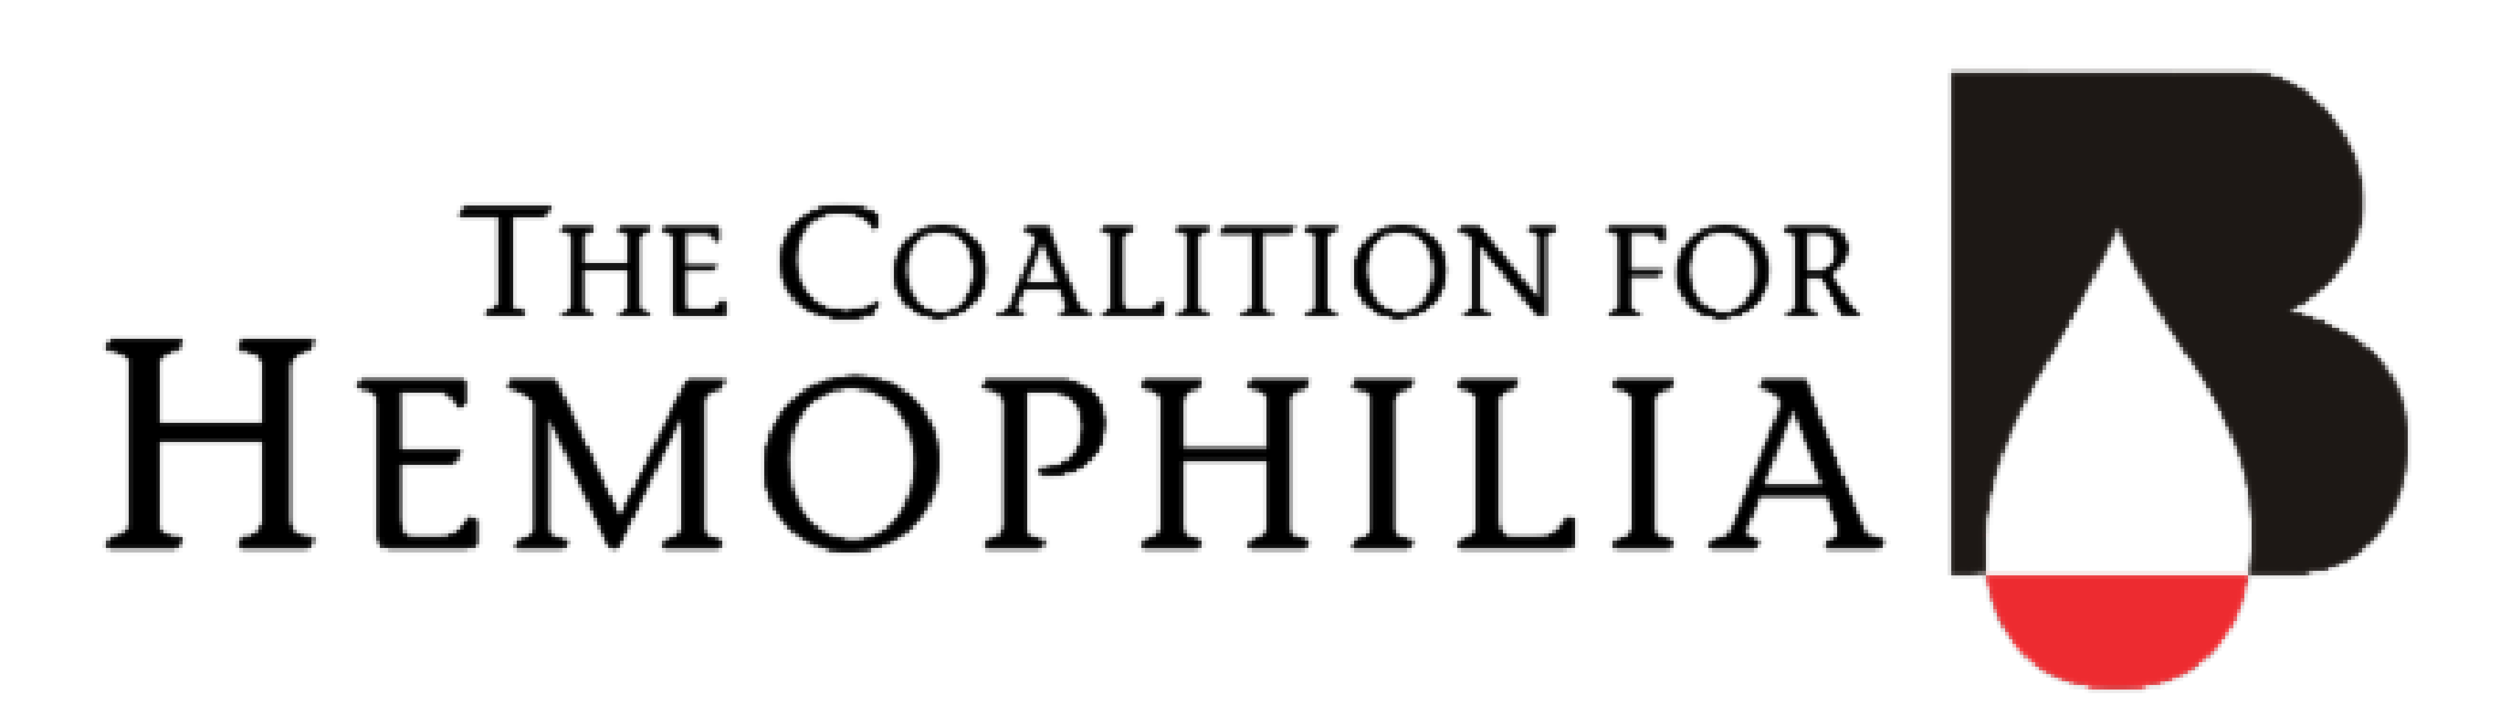 Hemo B cropped-02.png